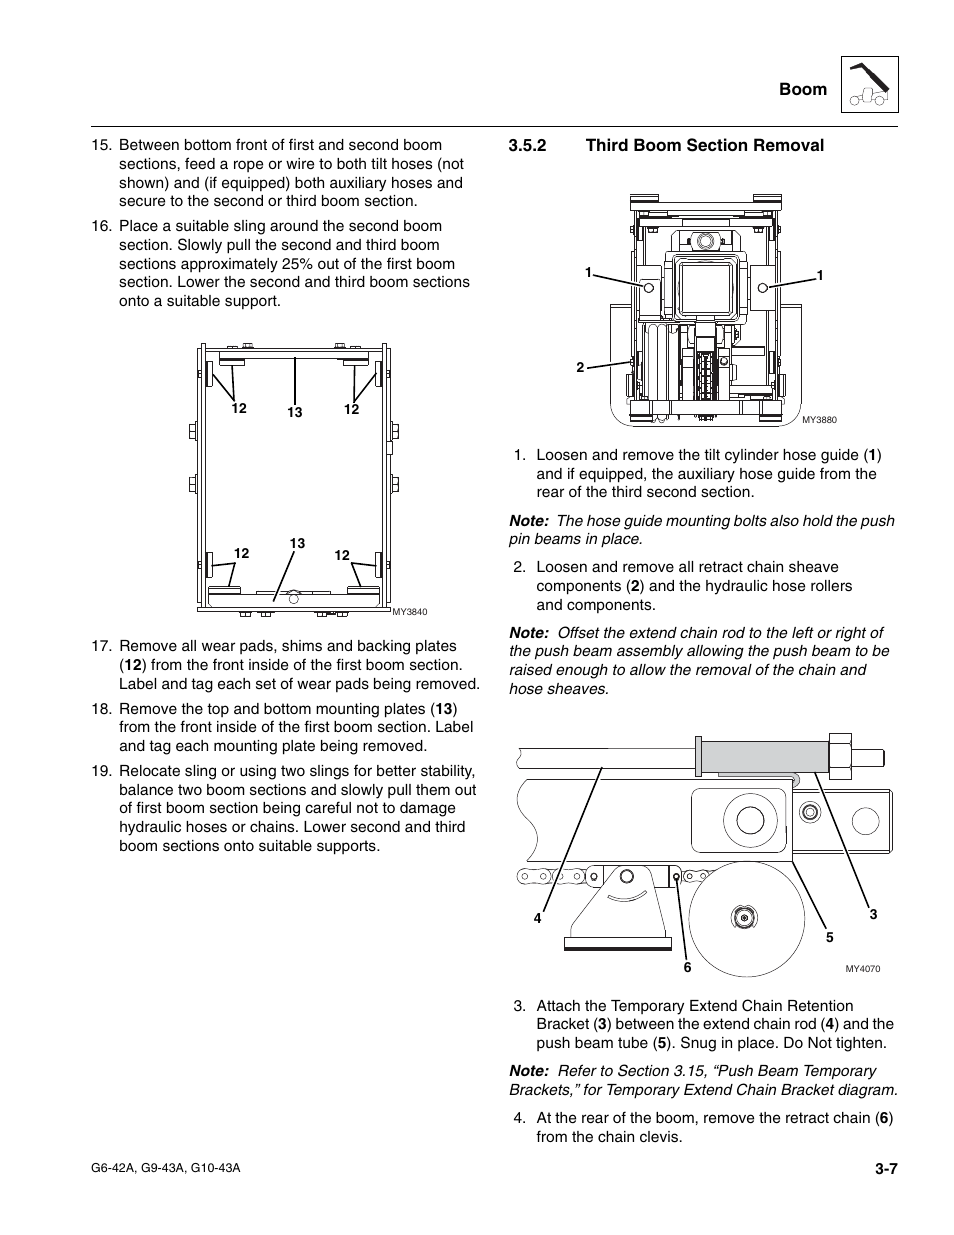 Boom Chain Diagram - Wiring Diagram Tri on toyota wiring schematics, hino wiring schematics, ingersoll rand wiring schematics, cushman wiring schematics, john deere wiring schematics, kubota wiring schematics, ford wiring schematics, hyster wiring schematics, komatsu wiring schematics, toro wiring schematics, husqvarna wiring schematics, yamaha wiring schematics, sullair wiring schematics, chevrolet wiring schematics, mack wiring schematics, honda wiring schematics, pierce wiring schematics, international wiring schematics, mazda wiring schematics, mitsubishi wiring schematics,